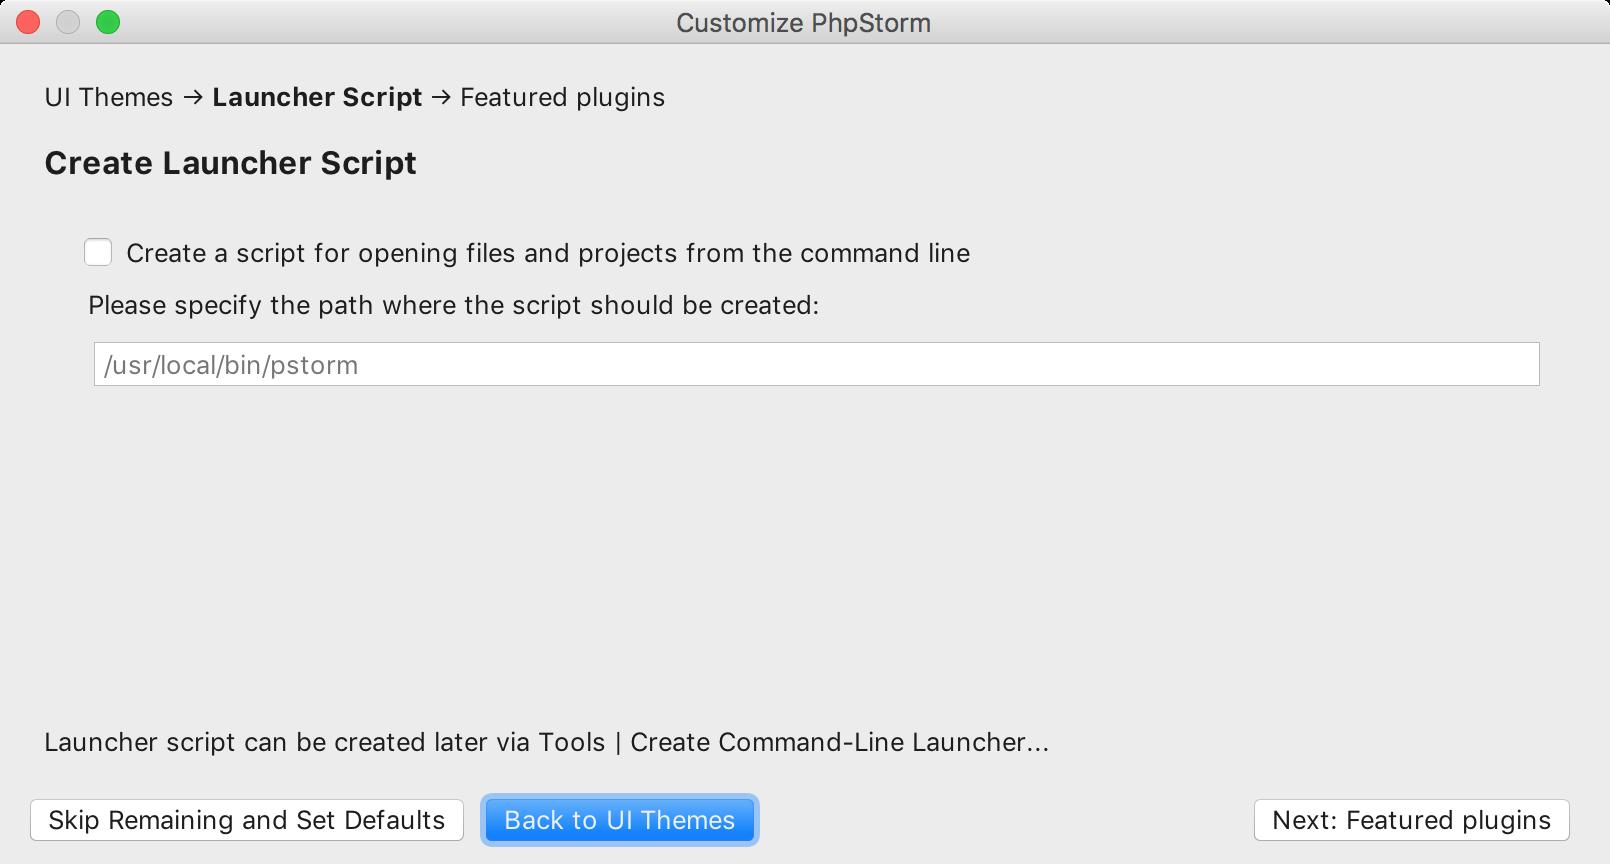 ps create launcher script